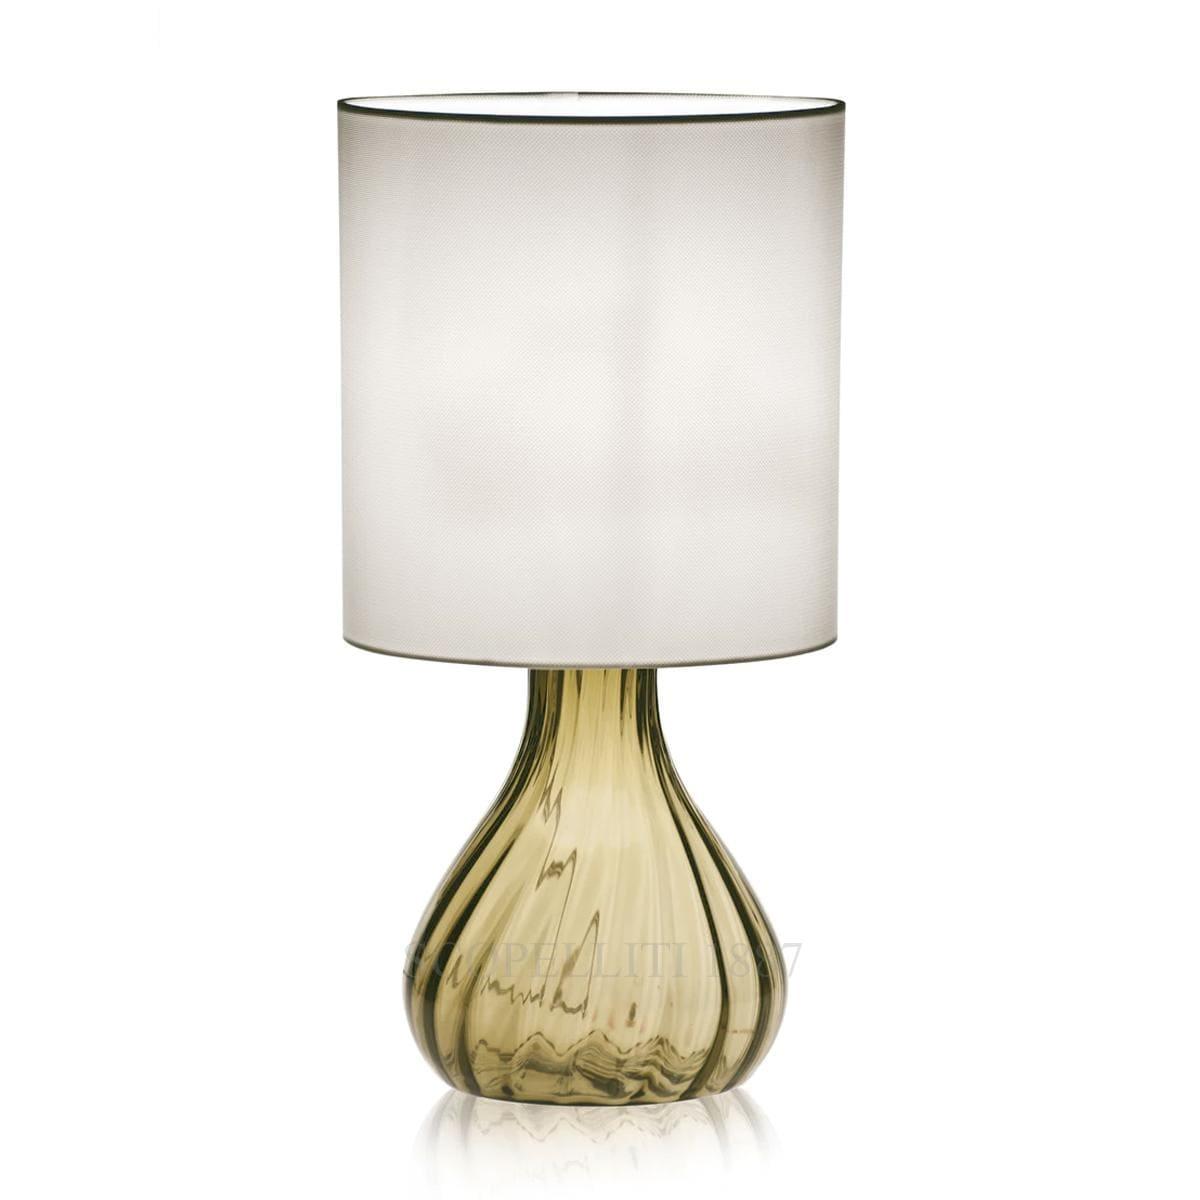 venini italian designer sand seltz table lamp murano glass